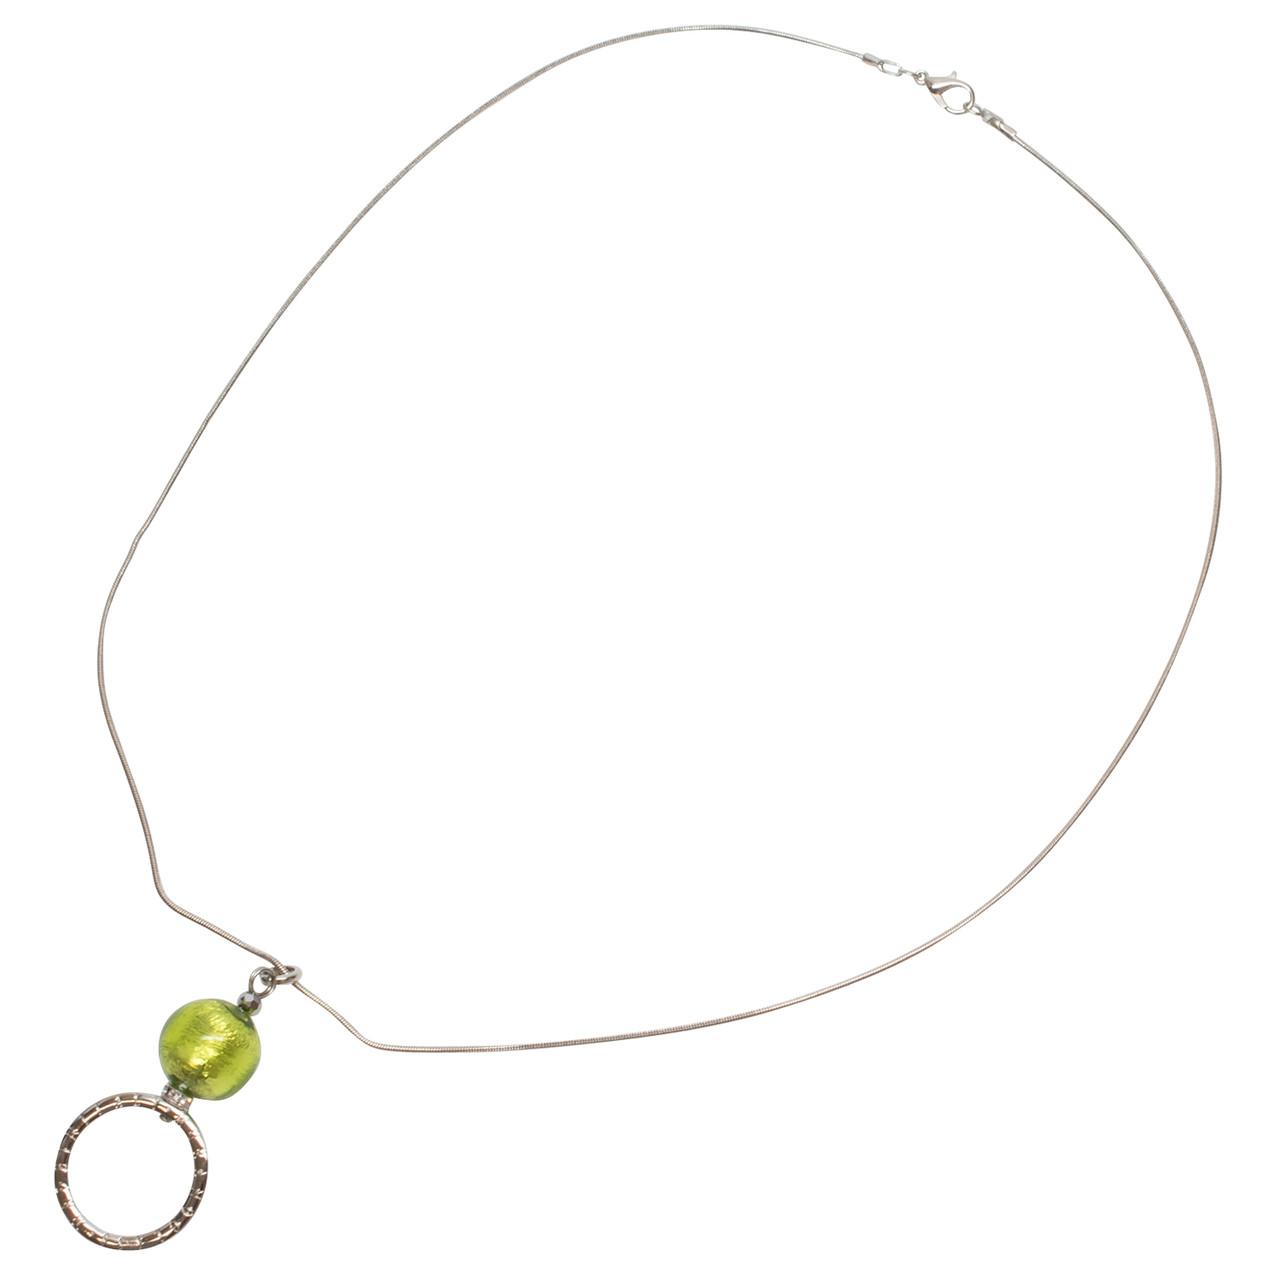 Calabria Sun/EyeGlass Necklace Sfera Murano Glass Sphere